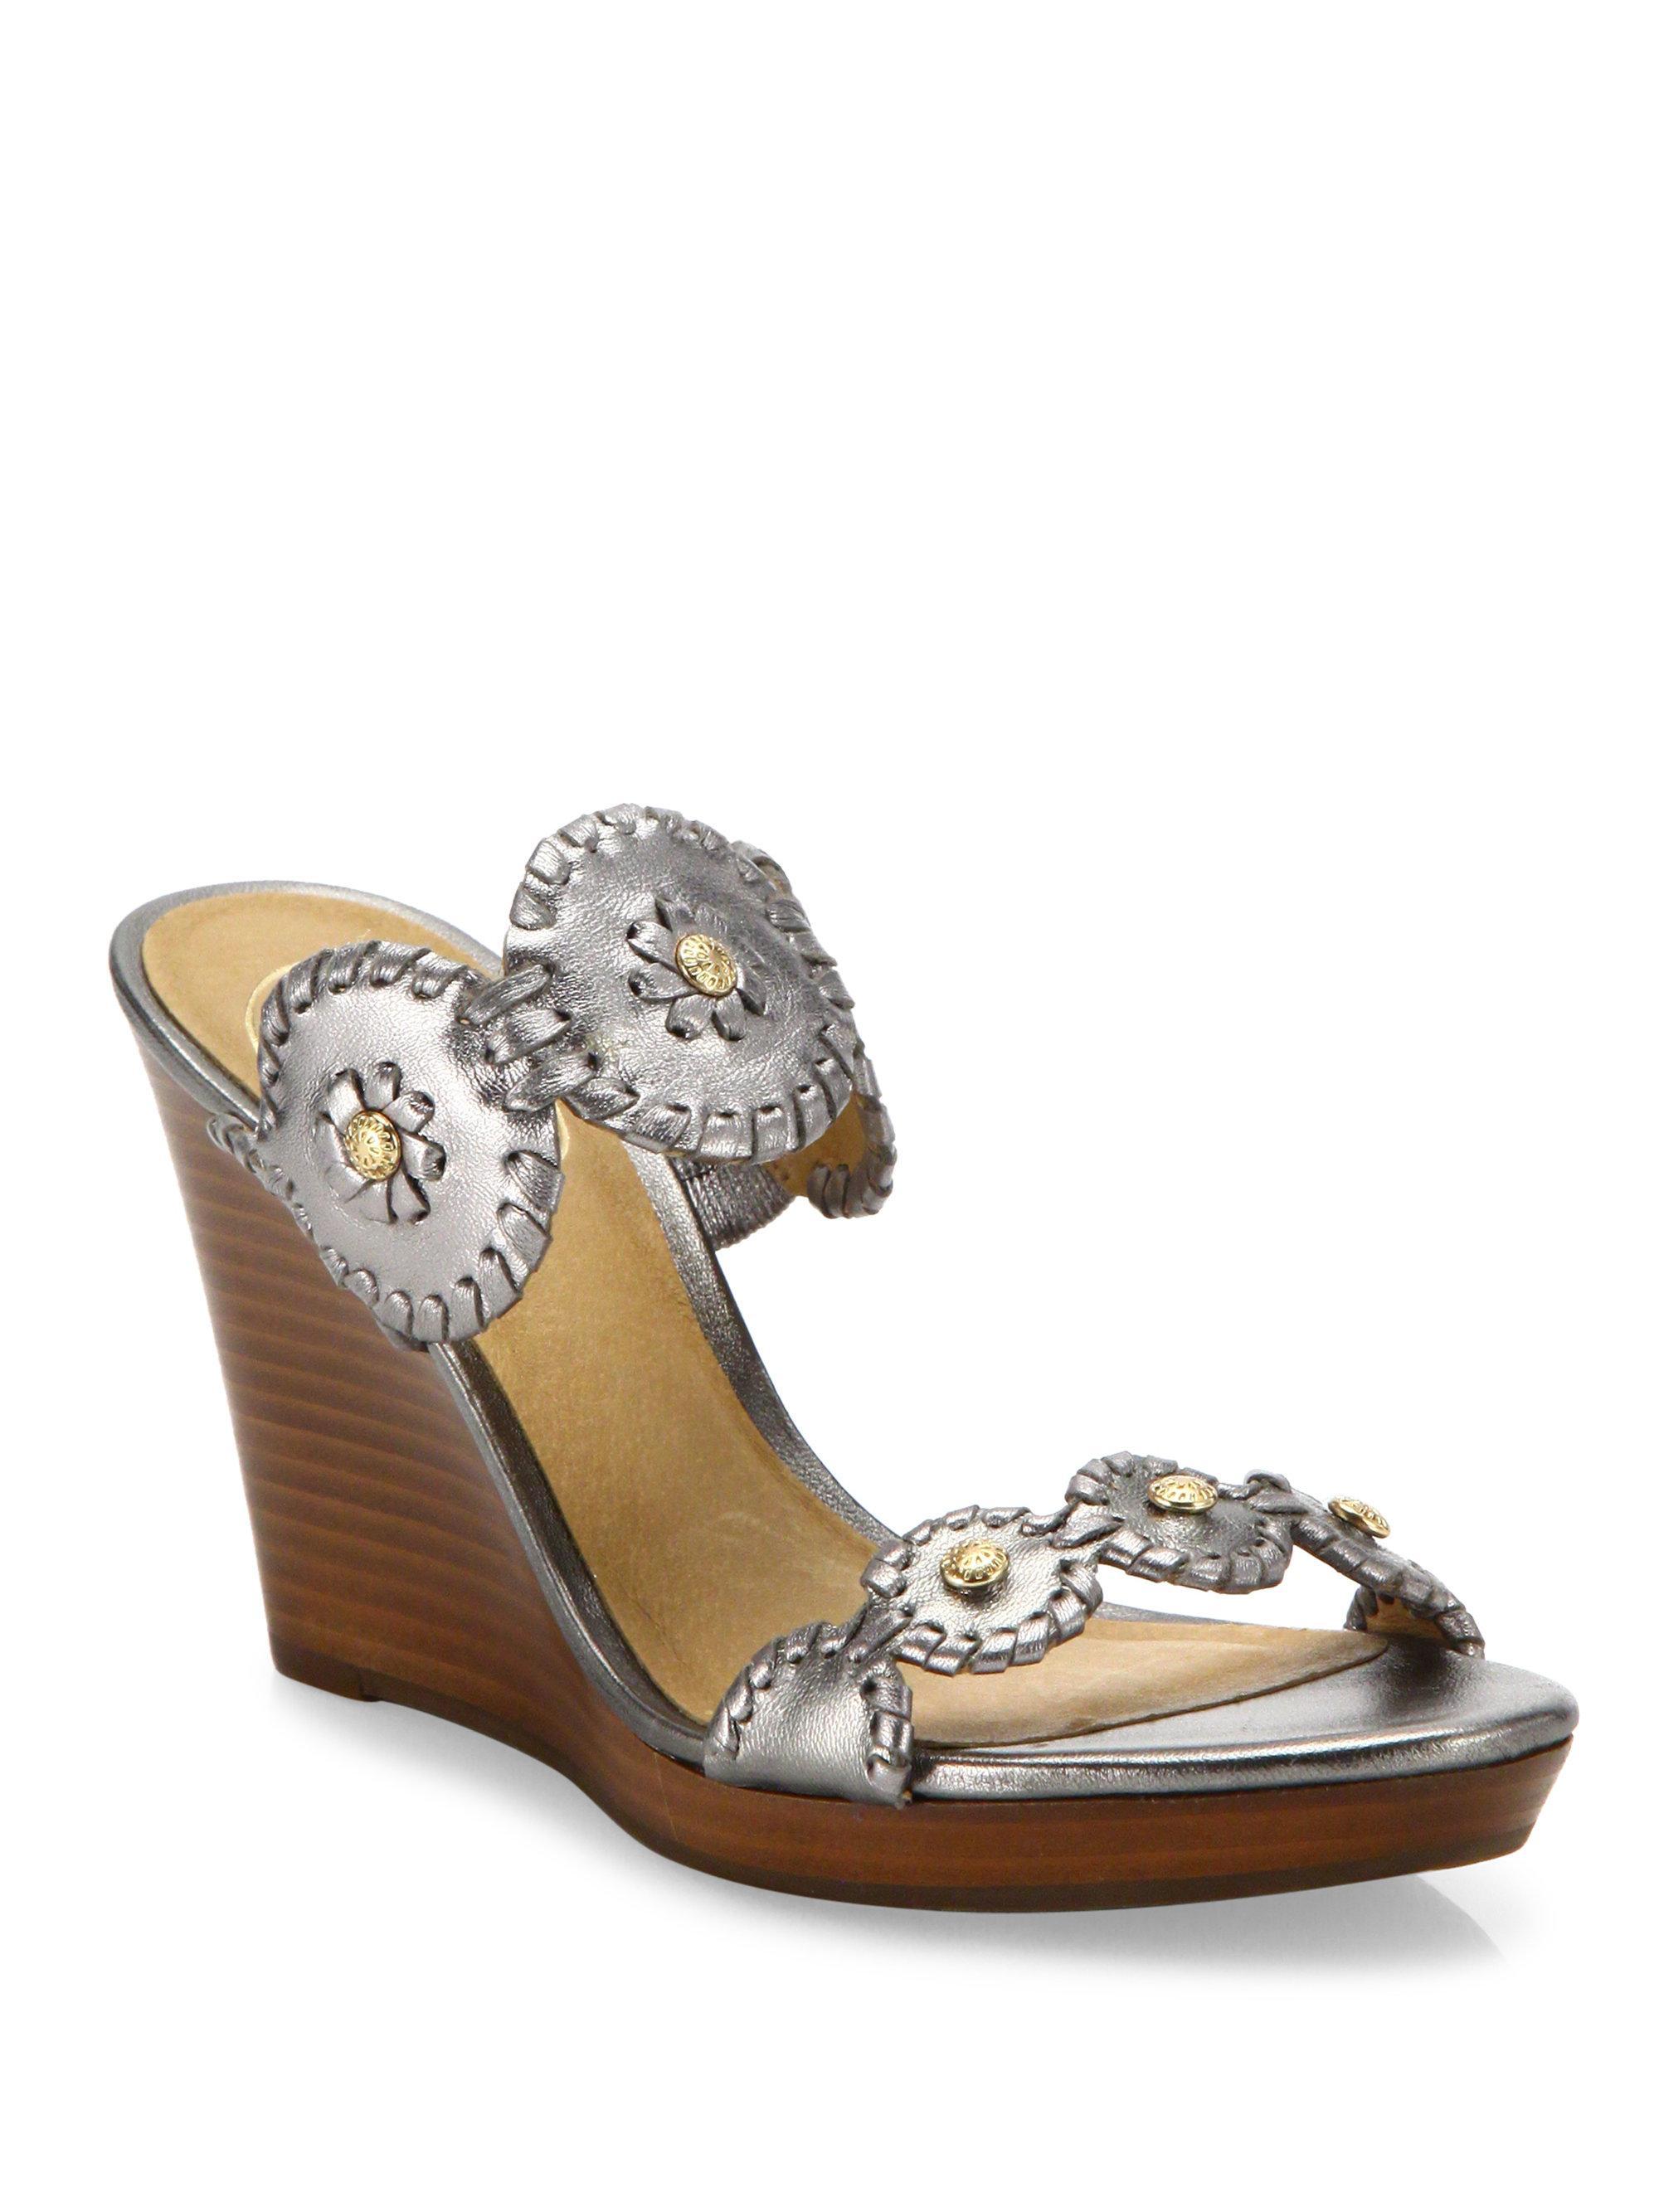 Jack Rogers Jr Layne Whipstitch Metallic Leather Wedge Sandals KlFEh33M7